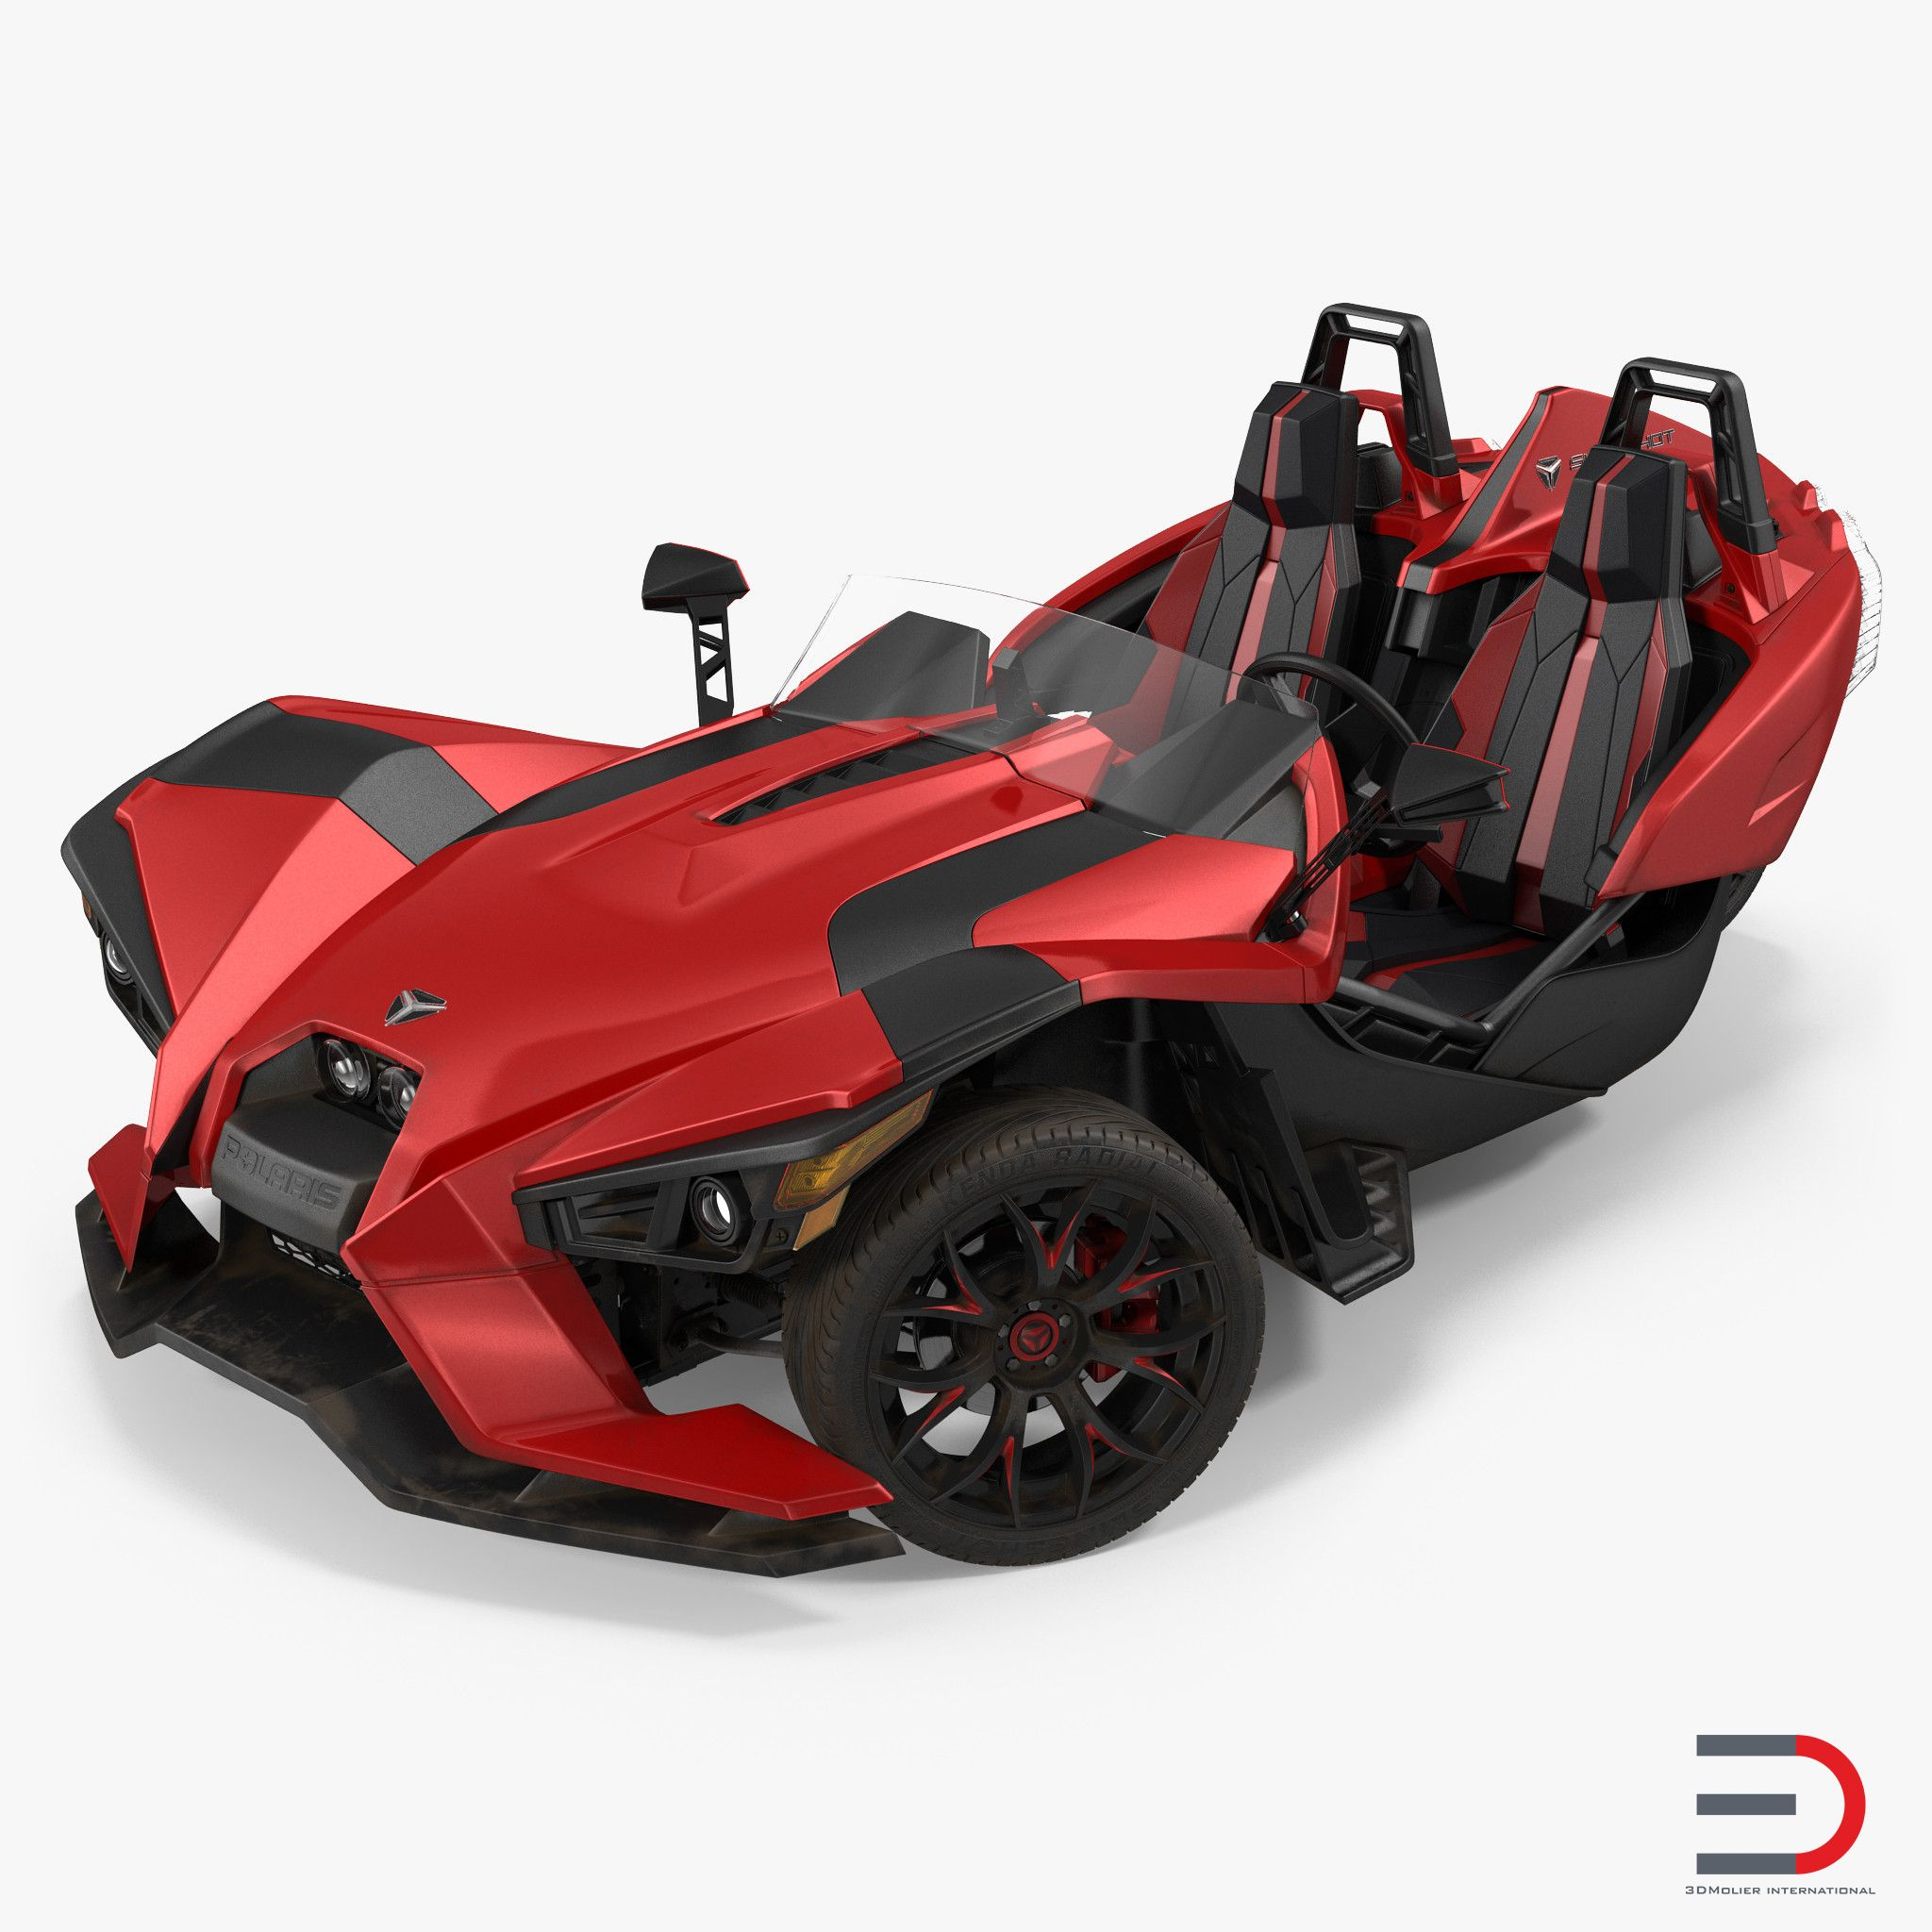 Polaris Slingshot Trike 3d model | 3D Models of Cars, Buses, Tanks ...